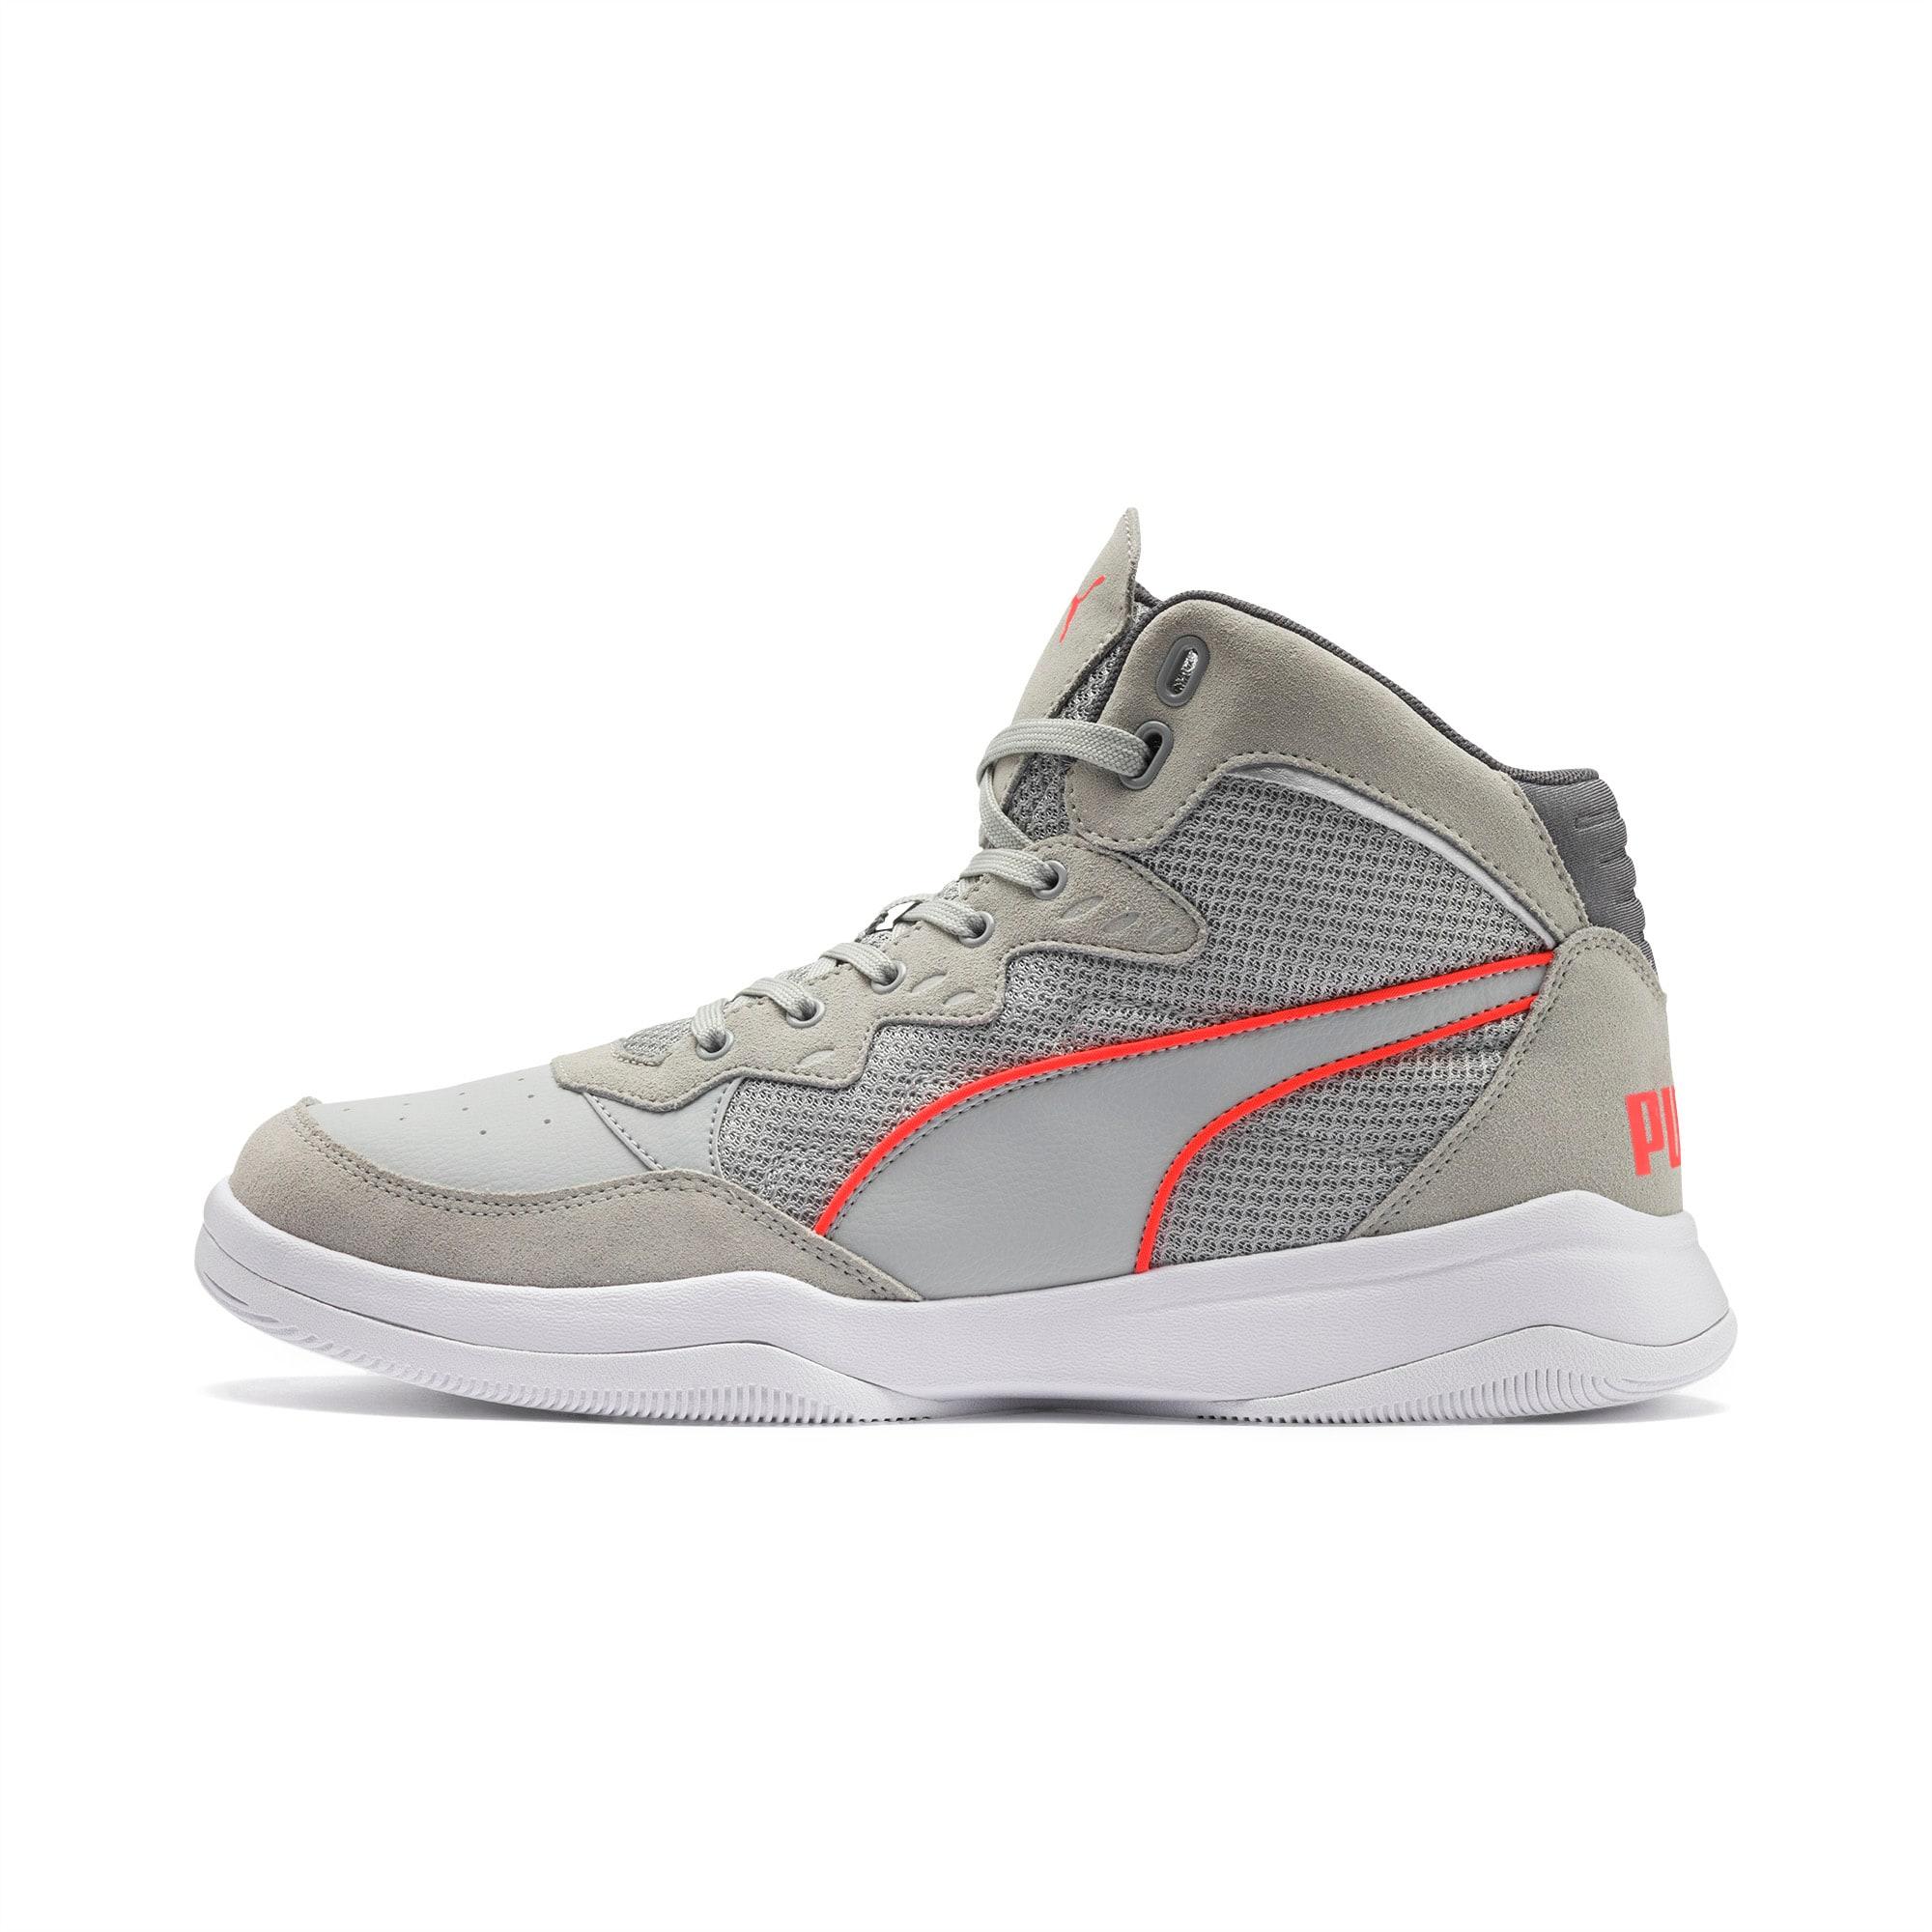 PUMA Rebound Playoff Suede Sneakers